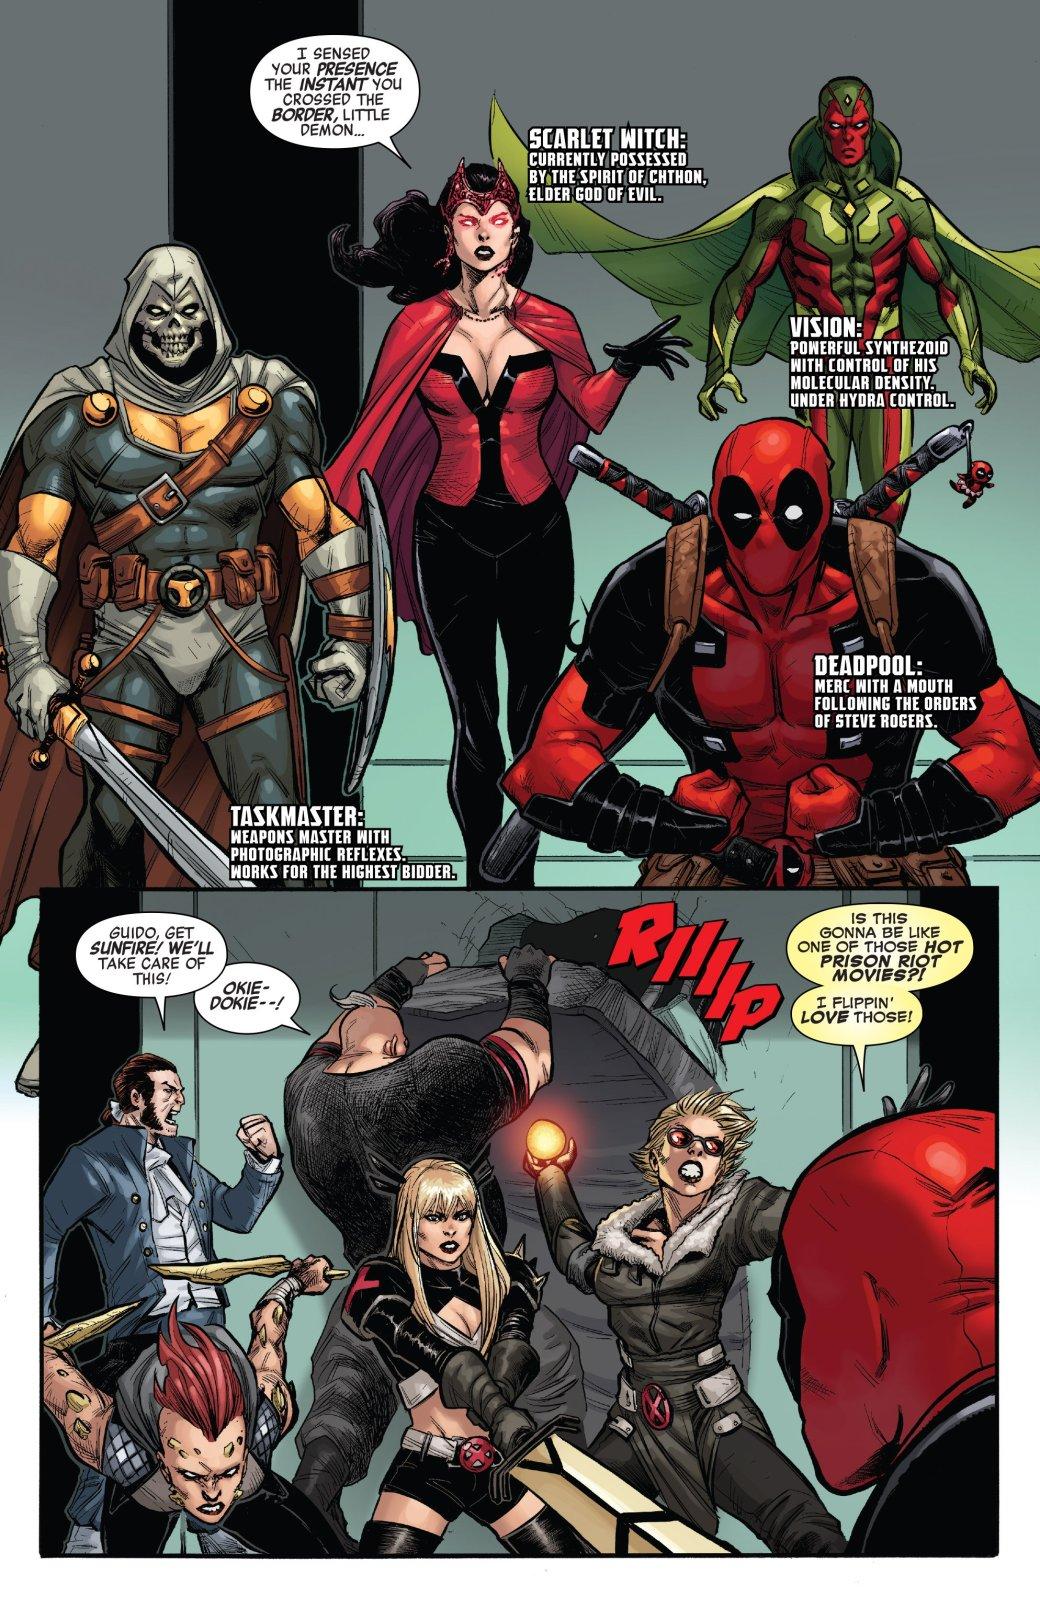 Secret Empire: противостоянию Стива Роджерса иТони Старка нет конца - Изображение 24